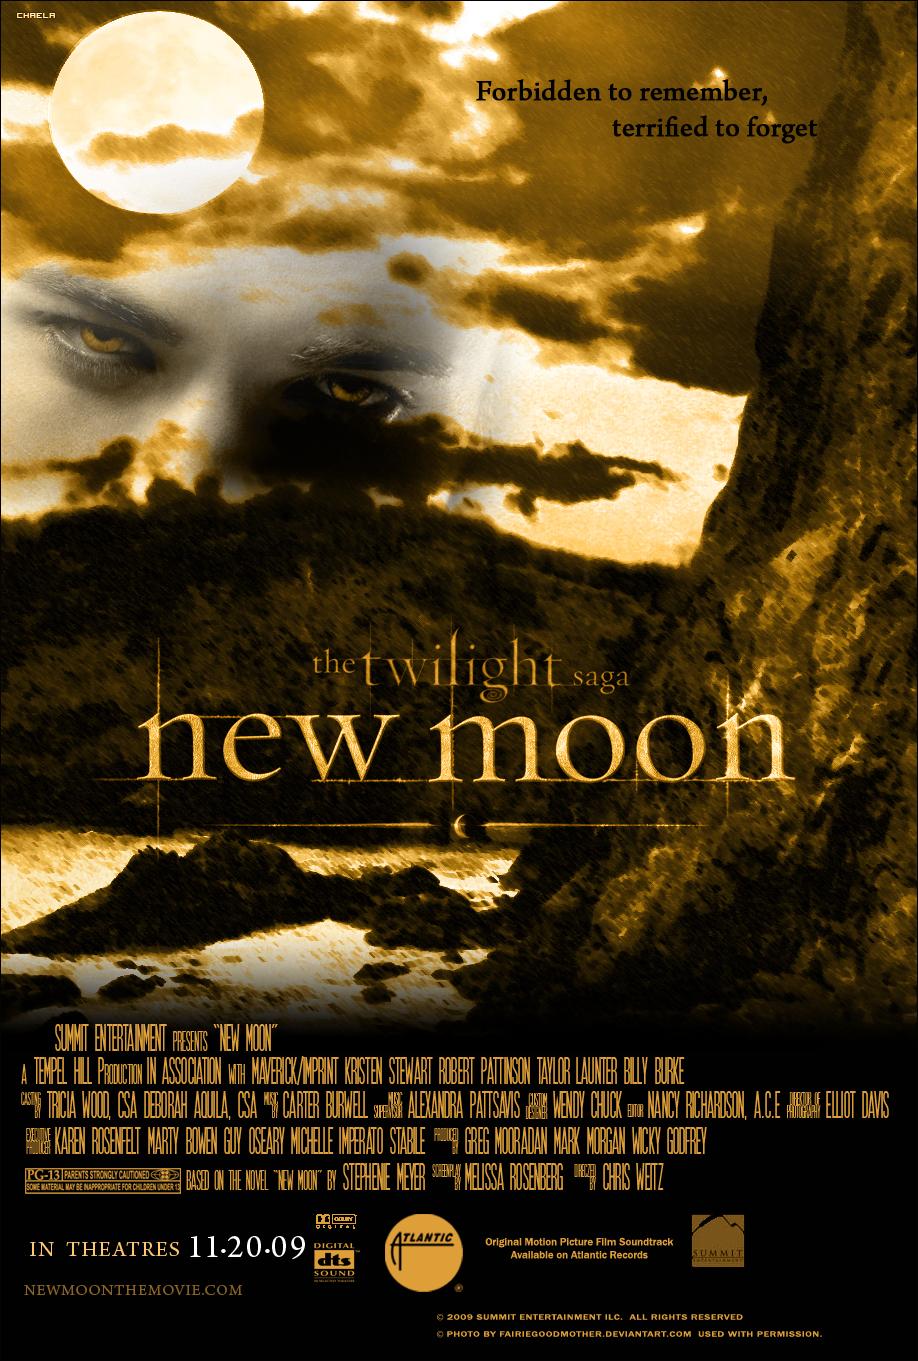 http://fc04.deviantart.com/fs42/f/2009/083/8/c/New_Moon_Poster_LaPush_Cliff_by_chaela_chan.jpg